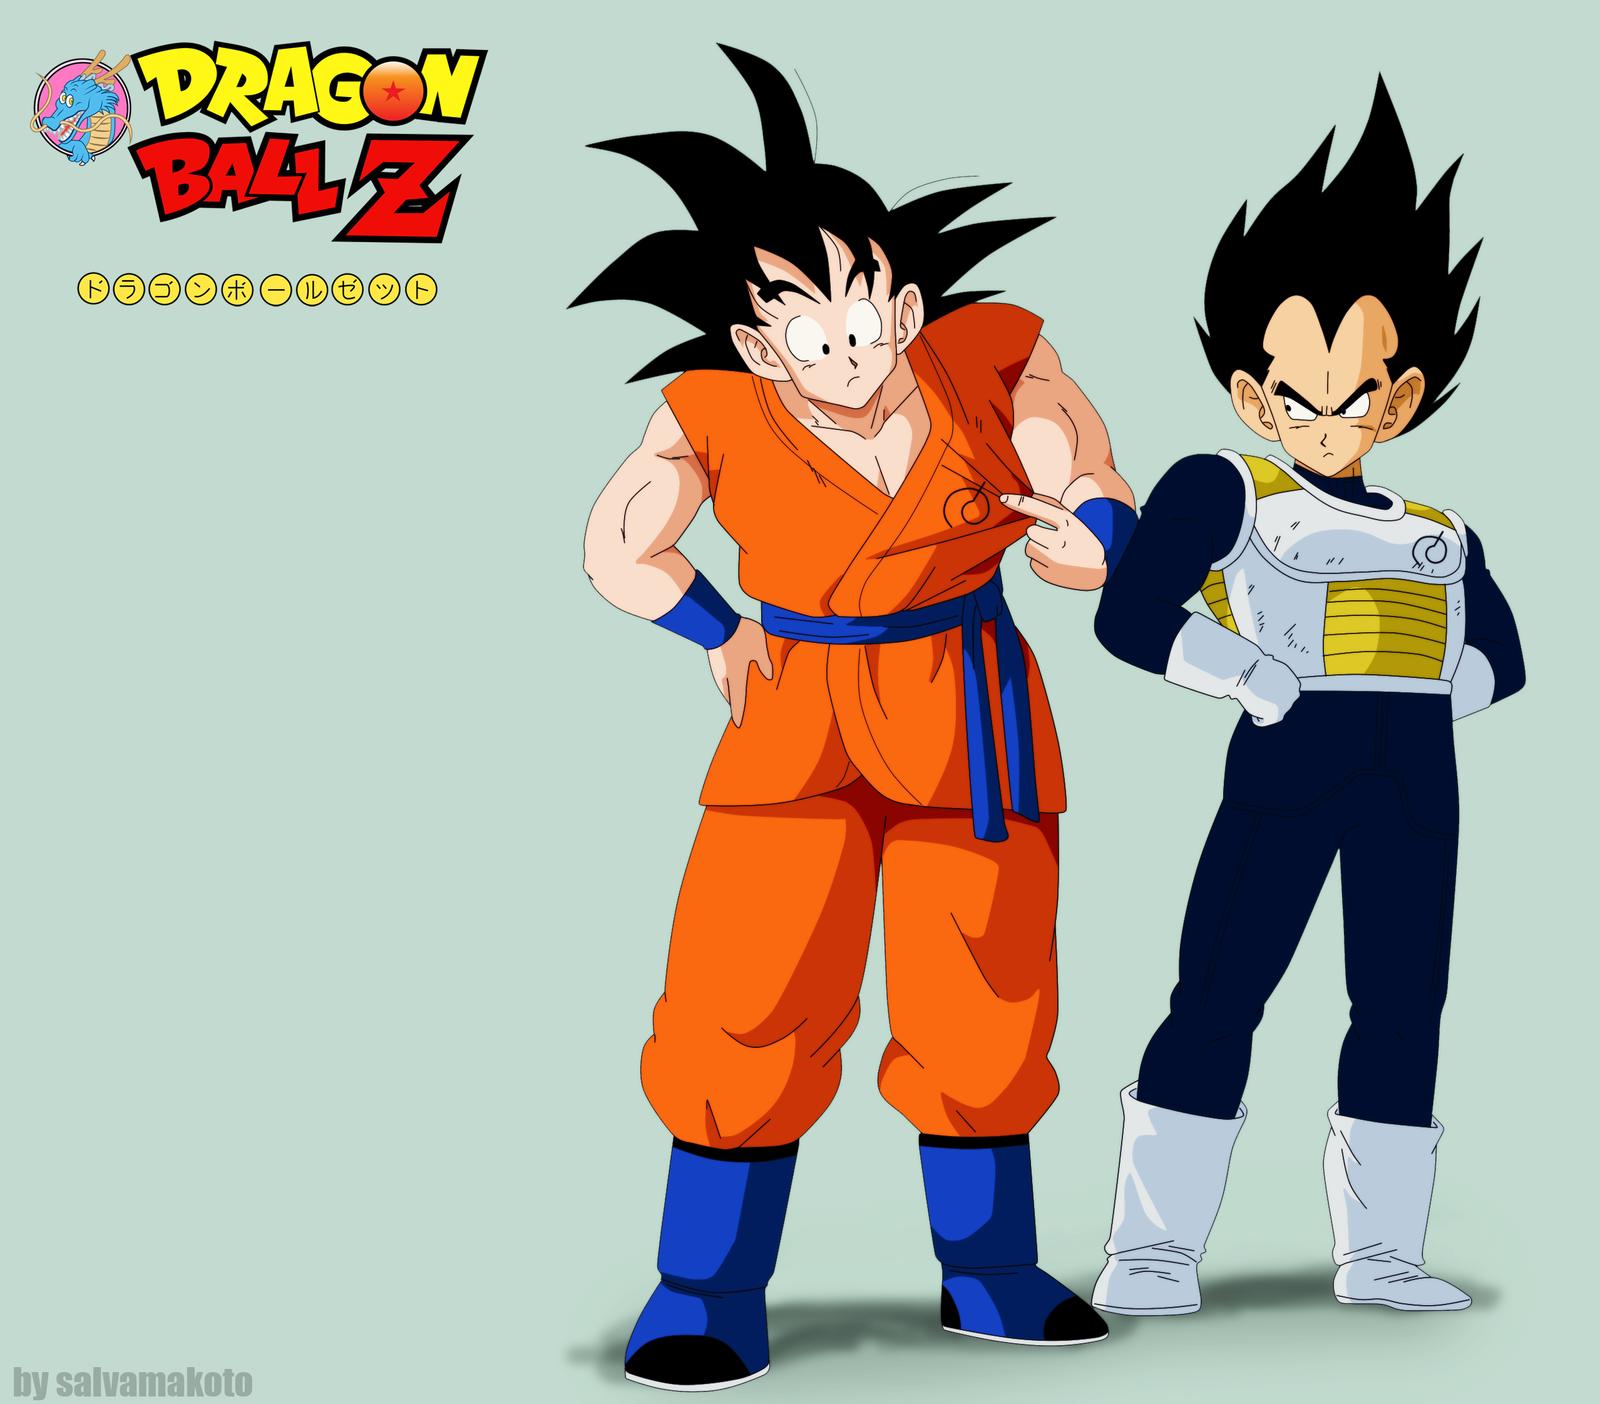 [Model Con Amxx] Goku-Fukkatsu V1.5 Goku_y_vegeta_estilo_1990__vestimenta_2015_by_salvamakoto-d8d33b5